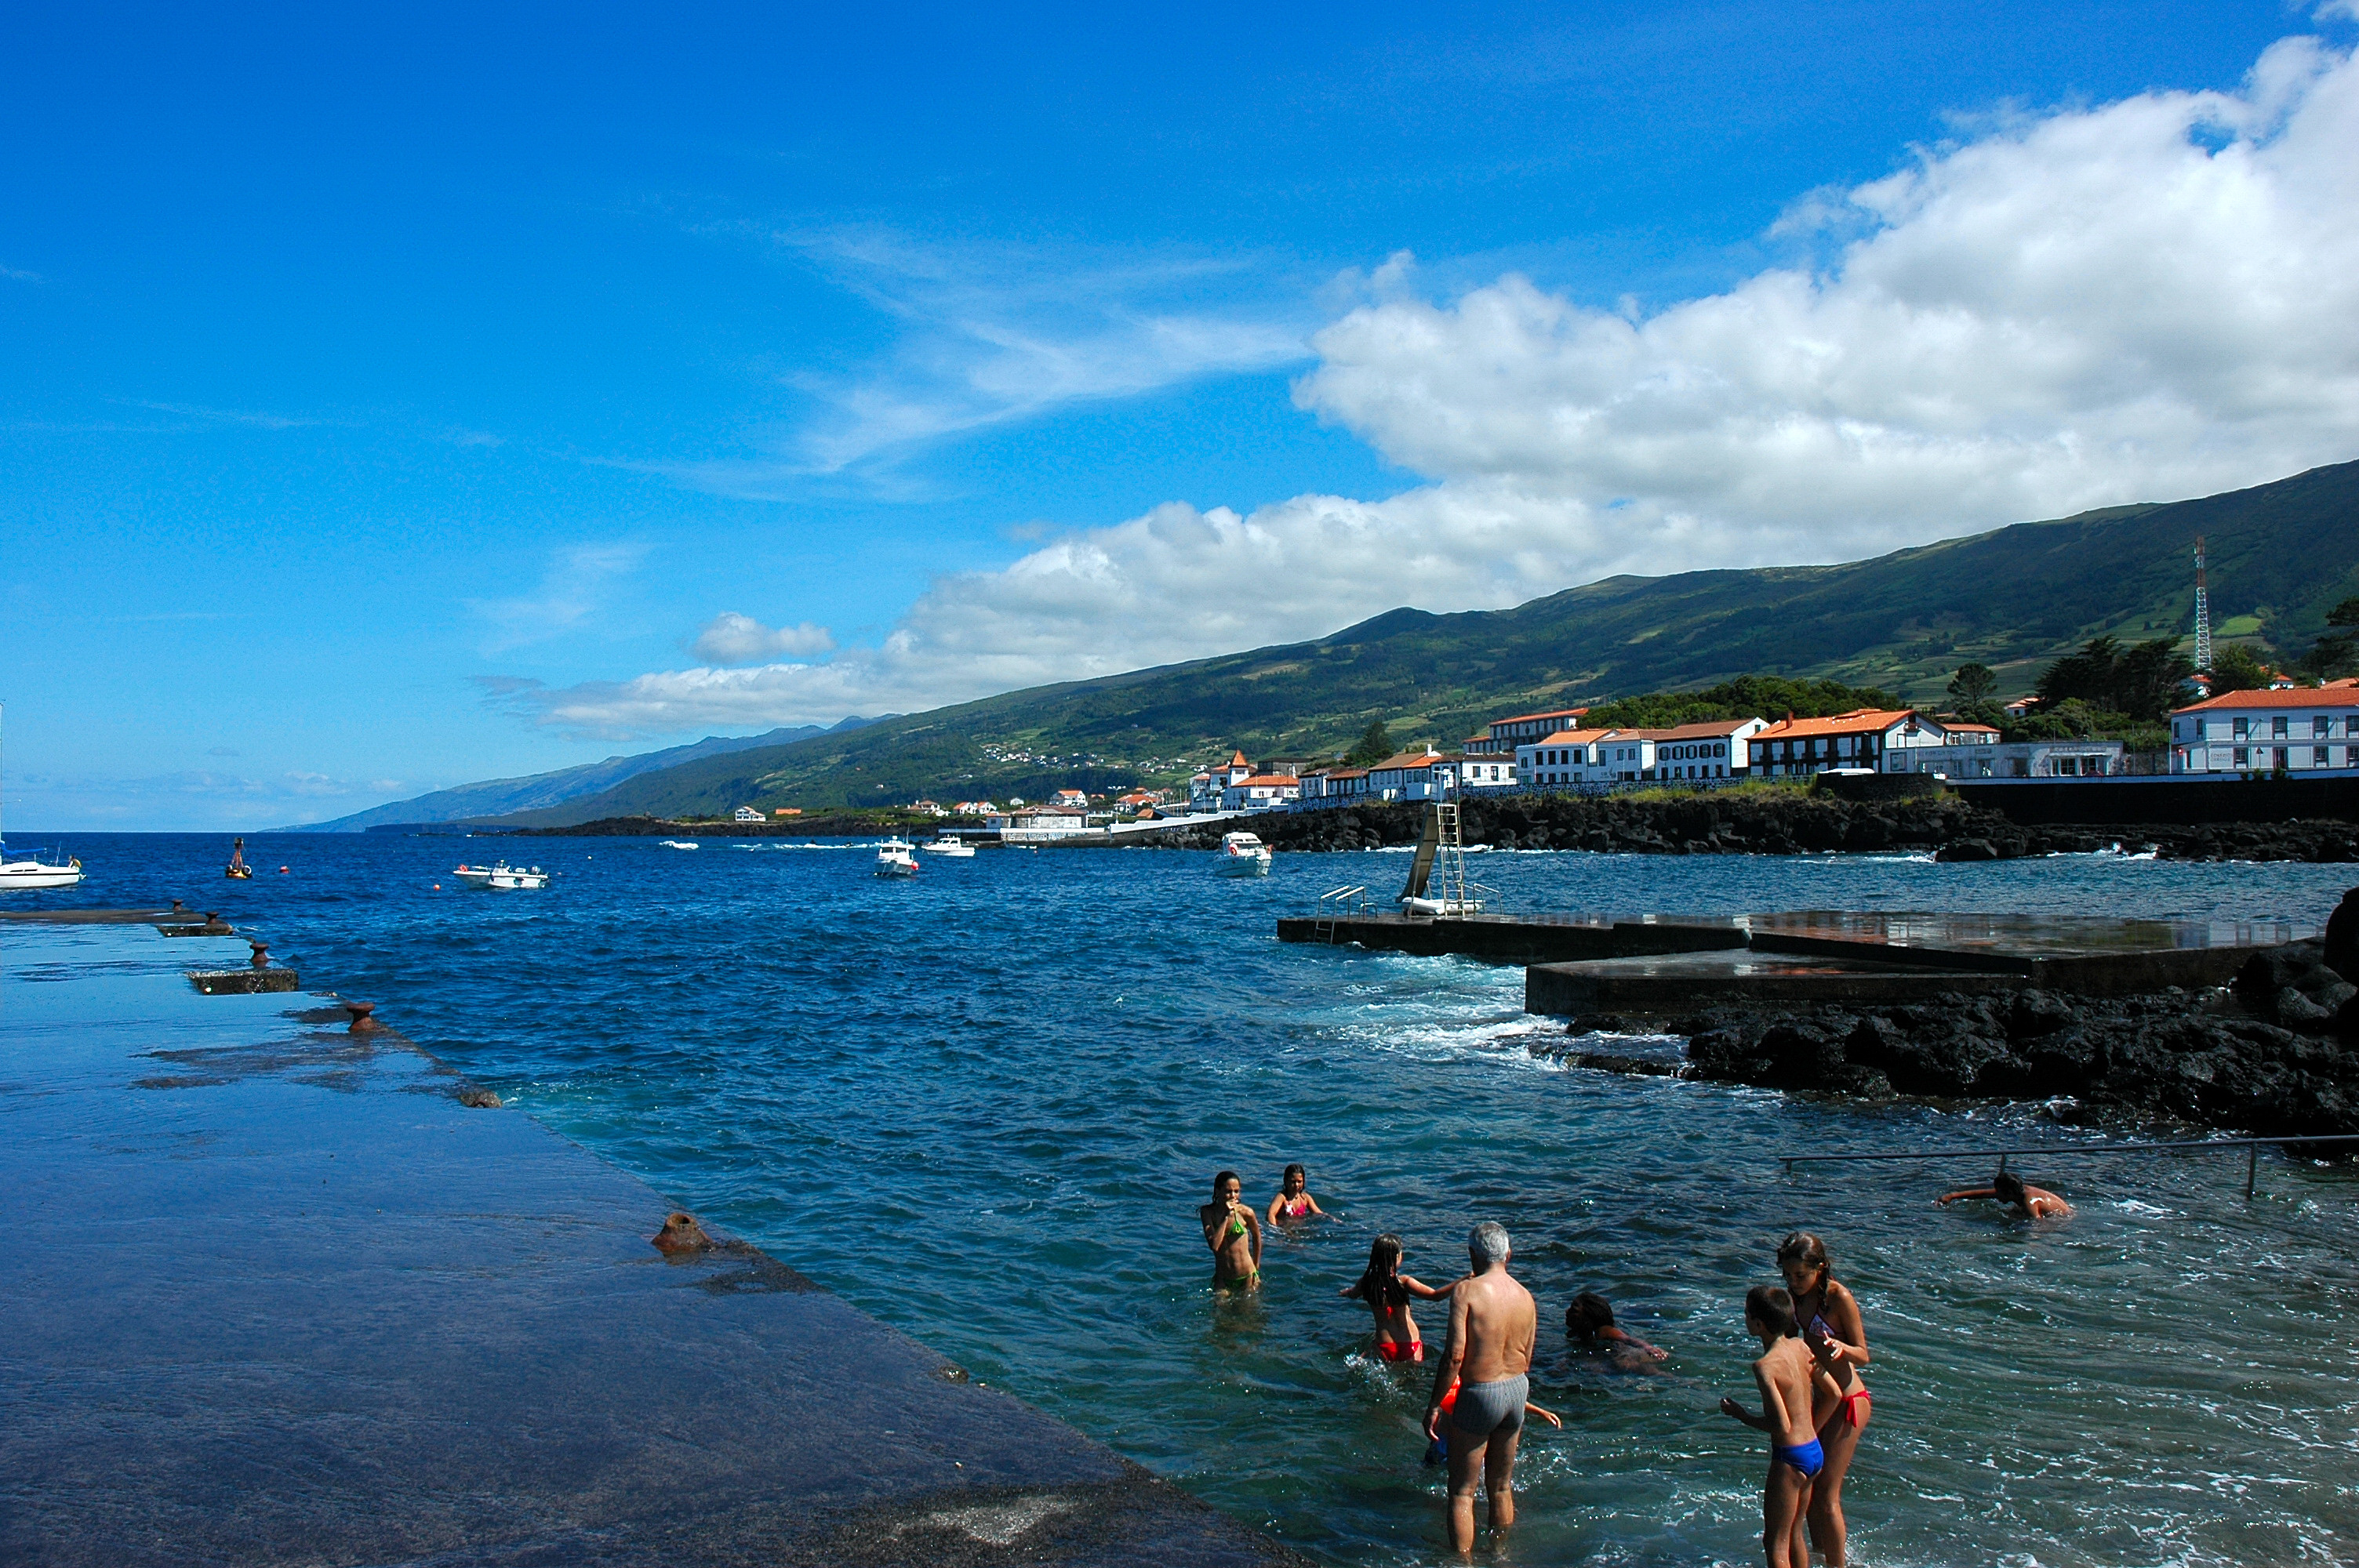 Noleggio Barche Sao Roque do Pico - Navalia | Noleggia un Sogno